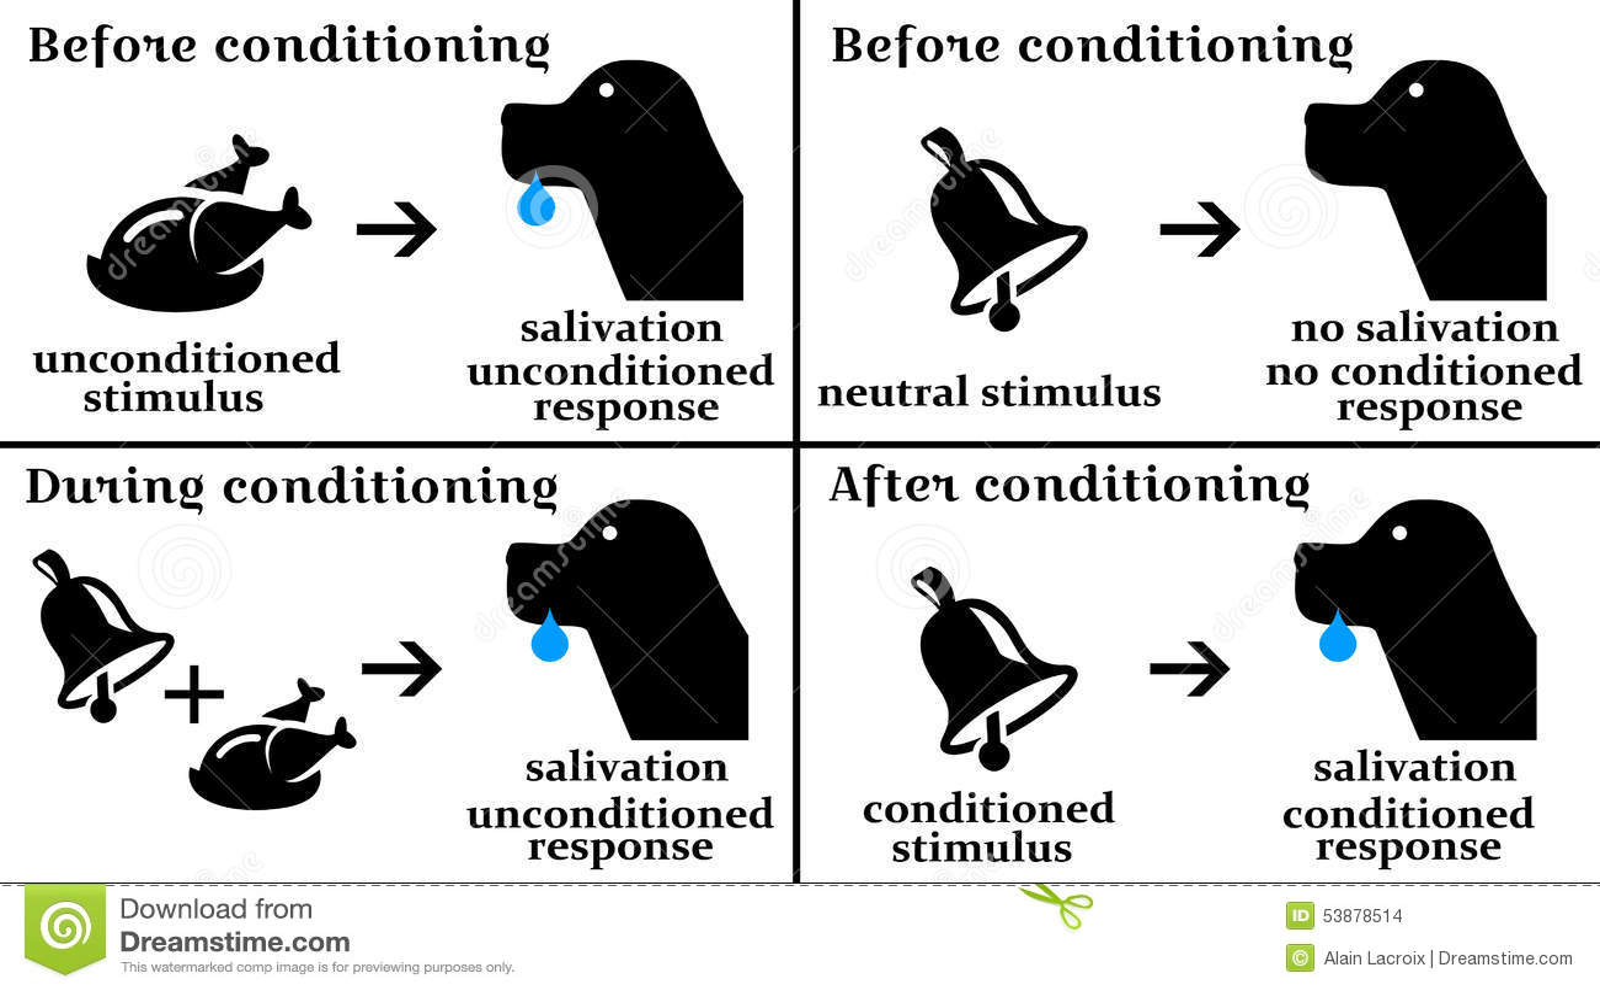 pavlovs-dog-diagram